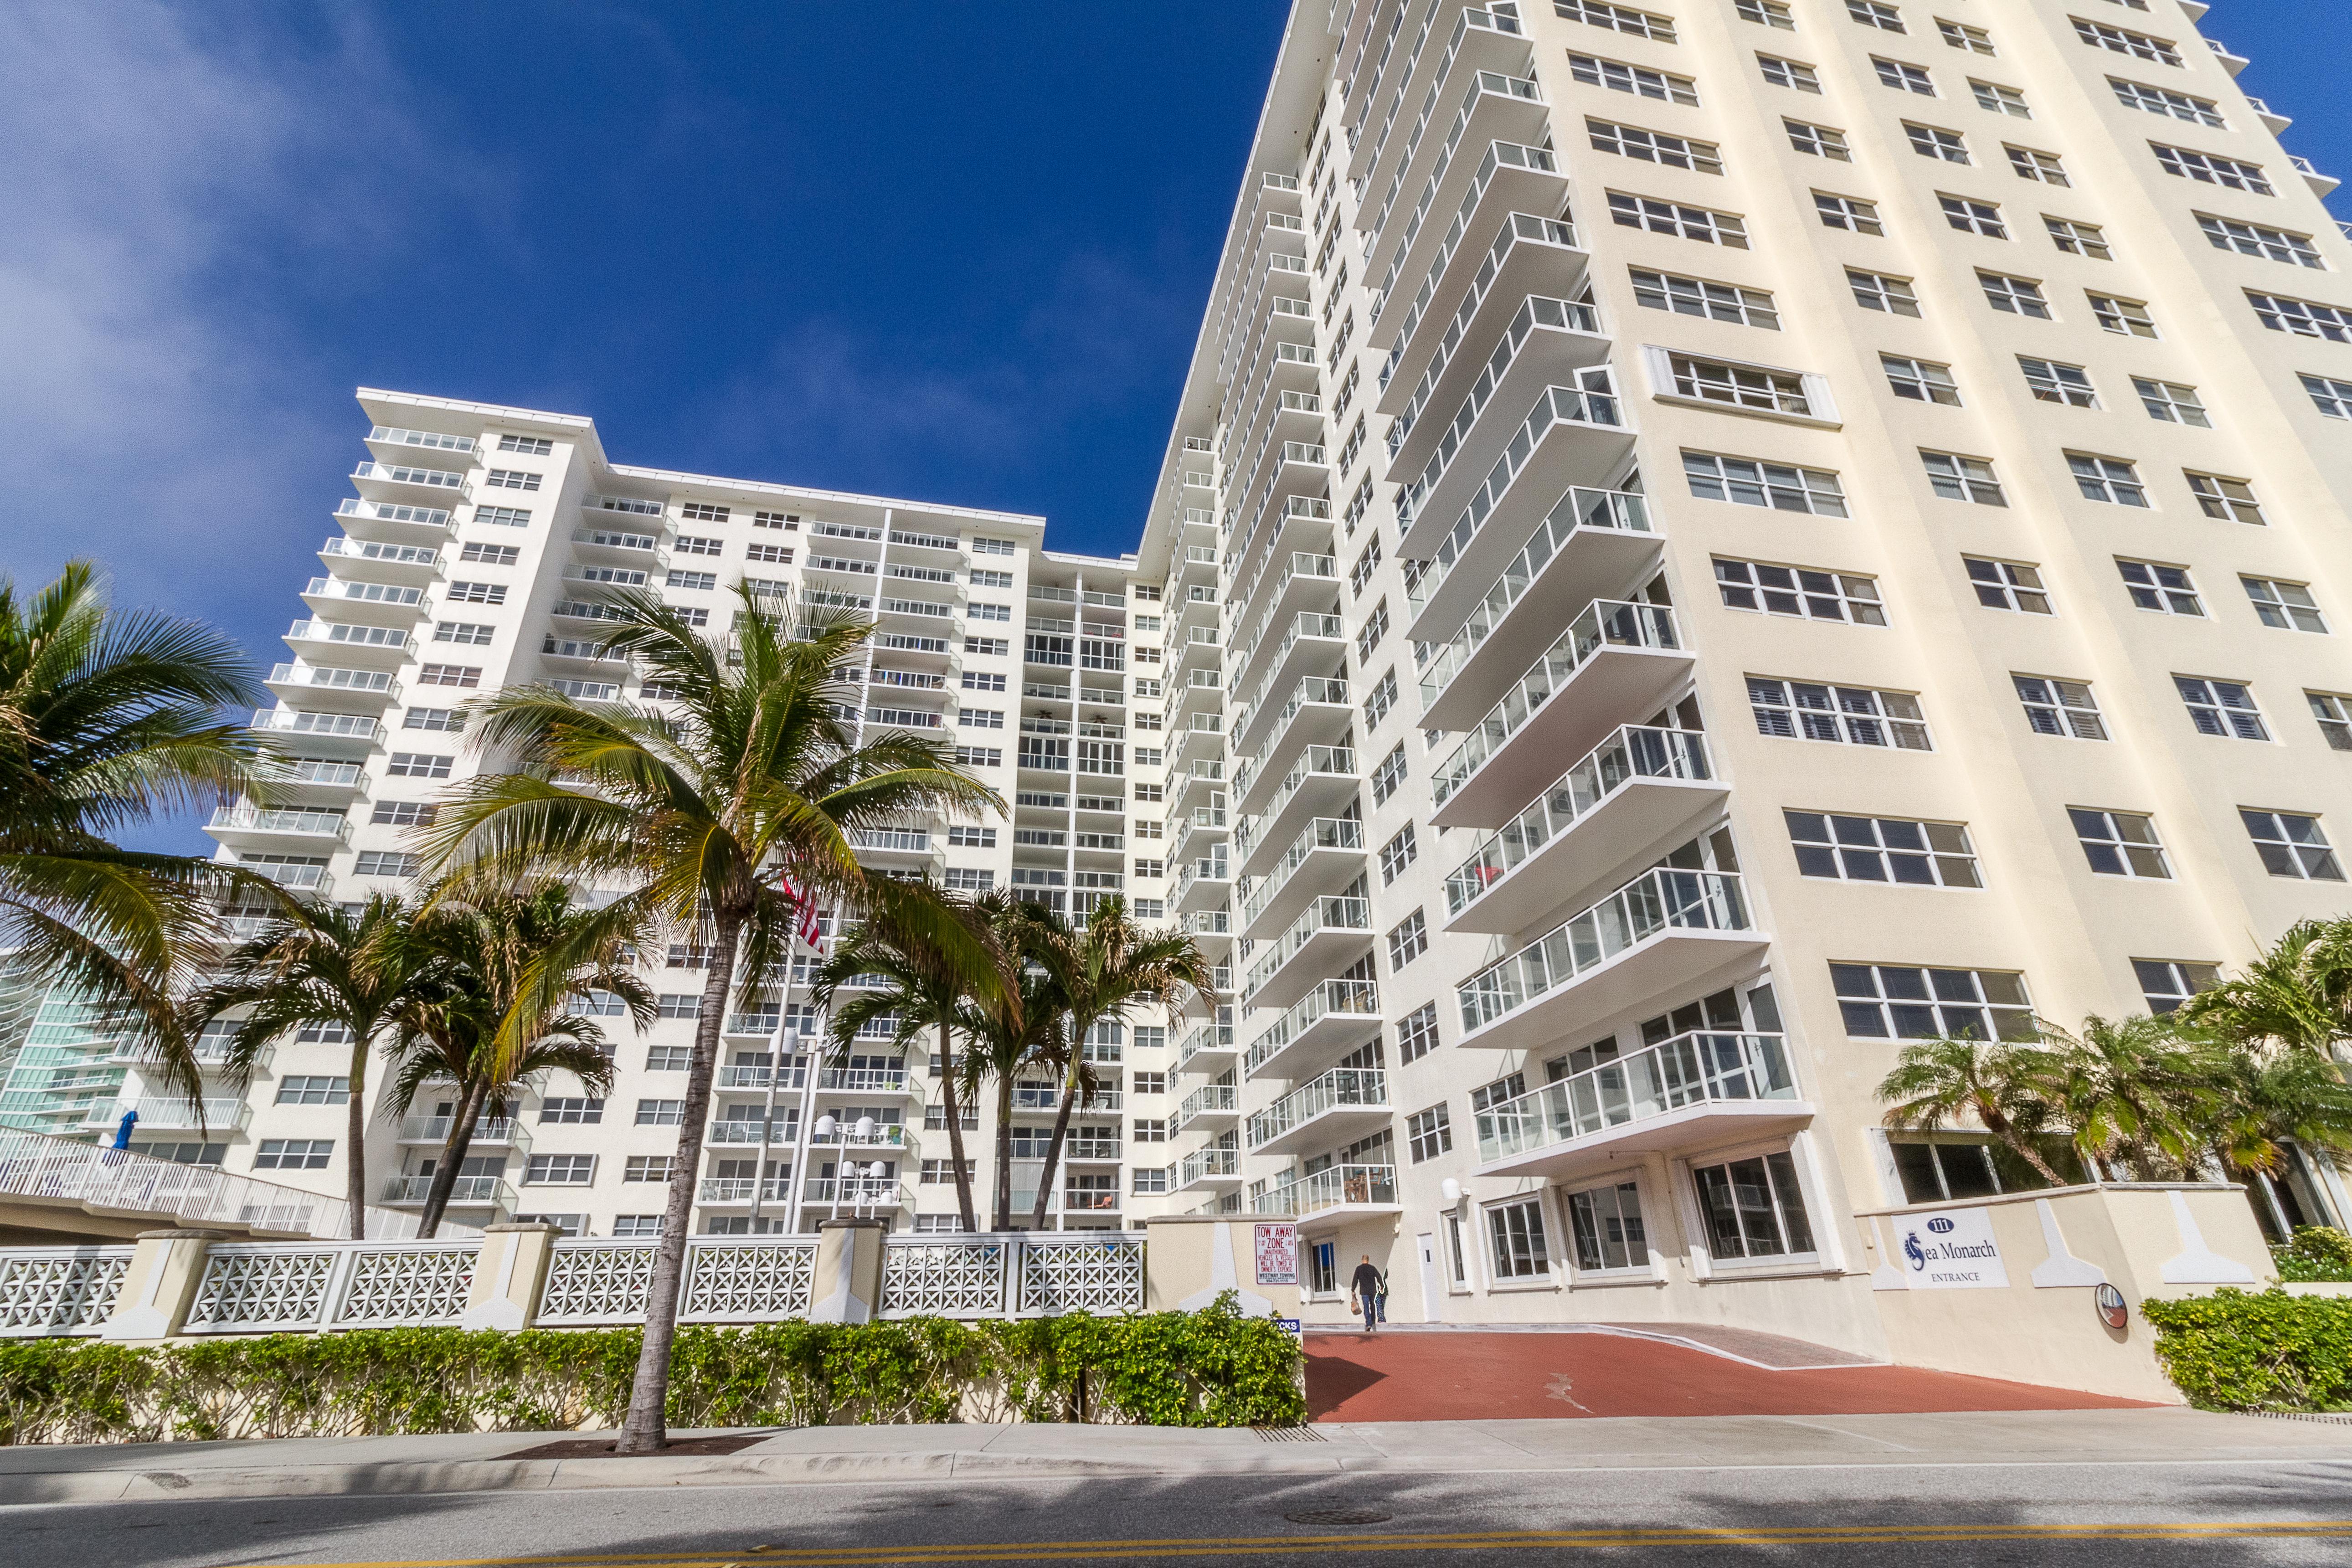 Condomínio para Venda às 111 N Pompano Beach Blvd #402 111 N Pompano Beach Blvd 402 Pompano Beach, Florida, 33062 Estados Unidos